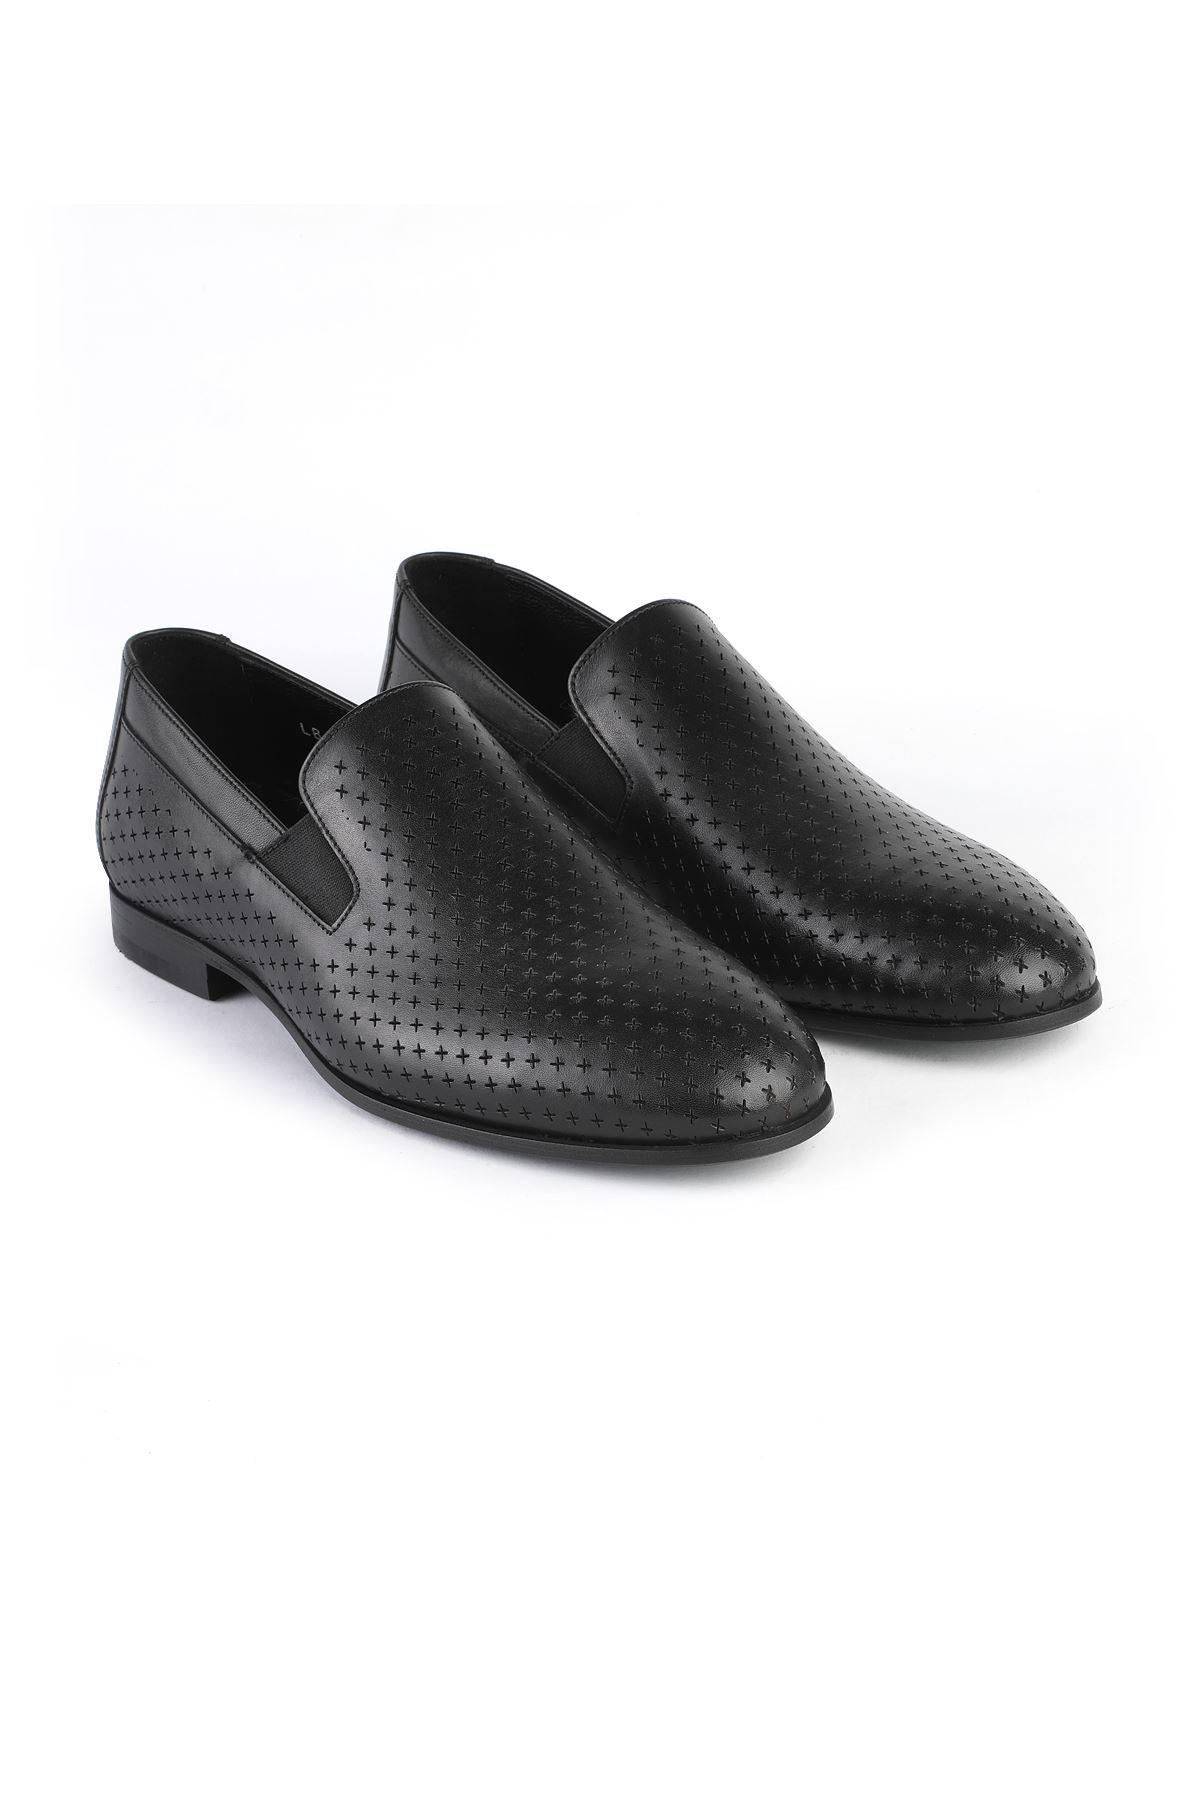 Libero 3266 Black Loafer Shoes